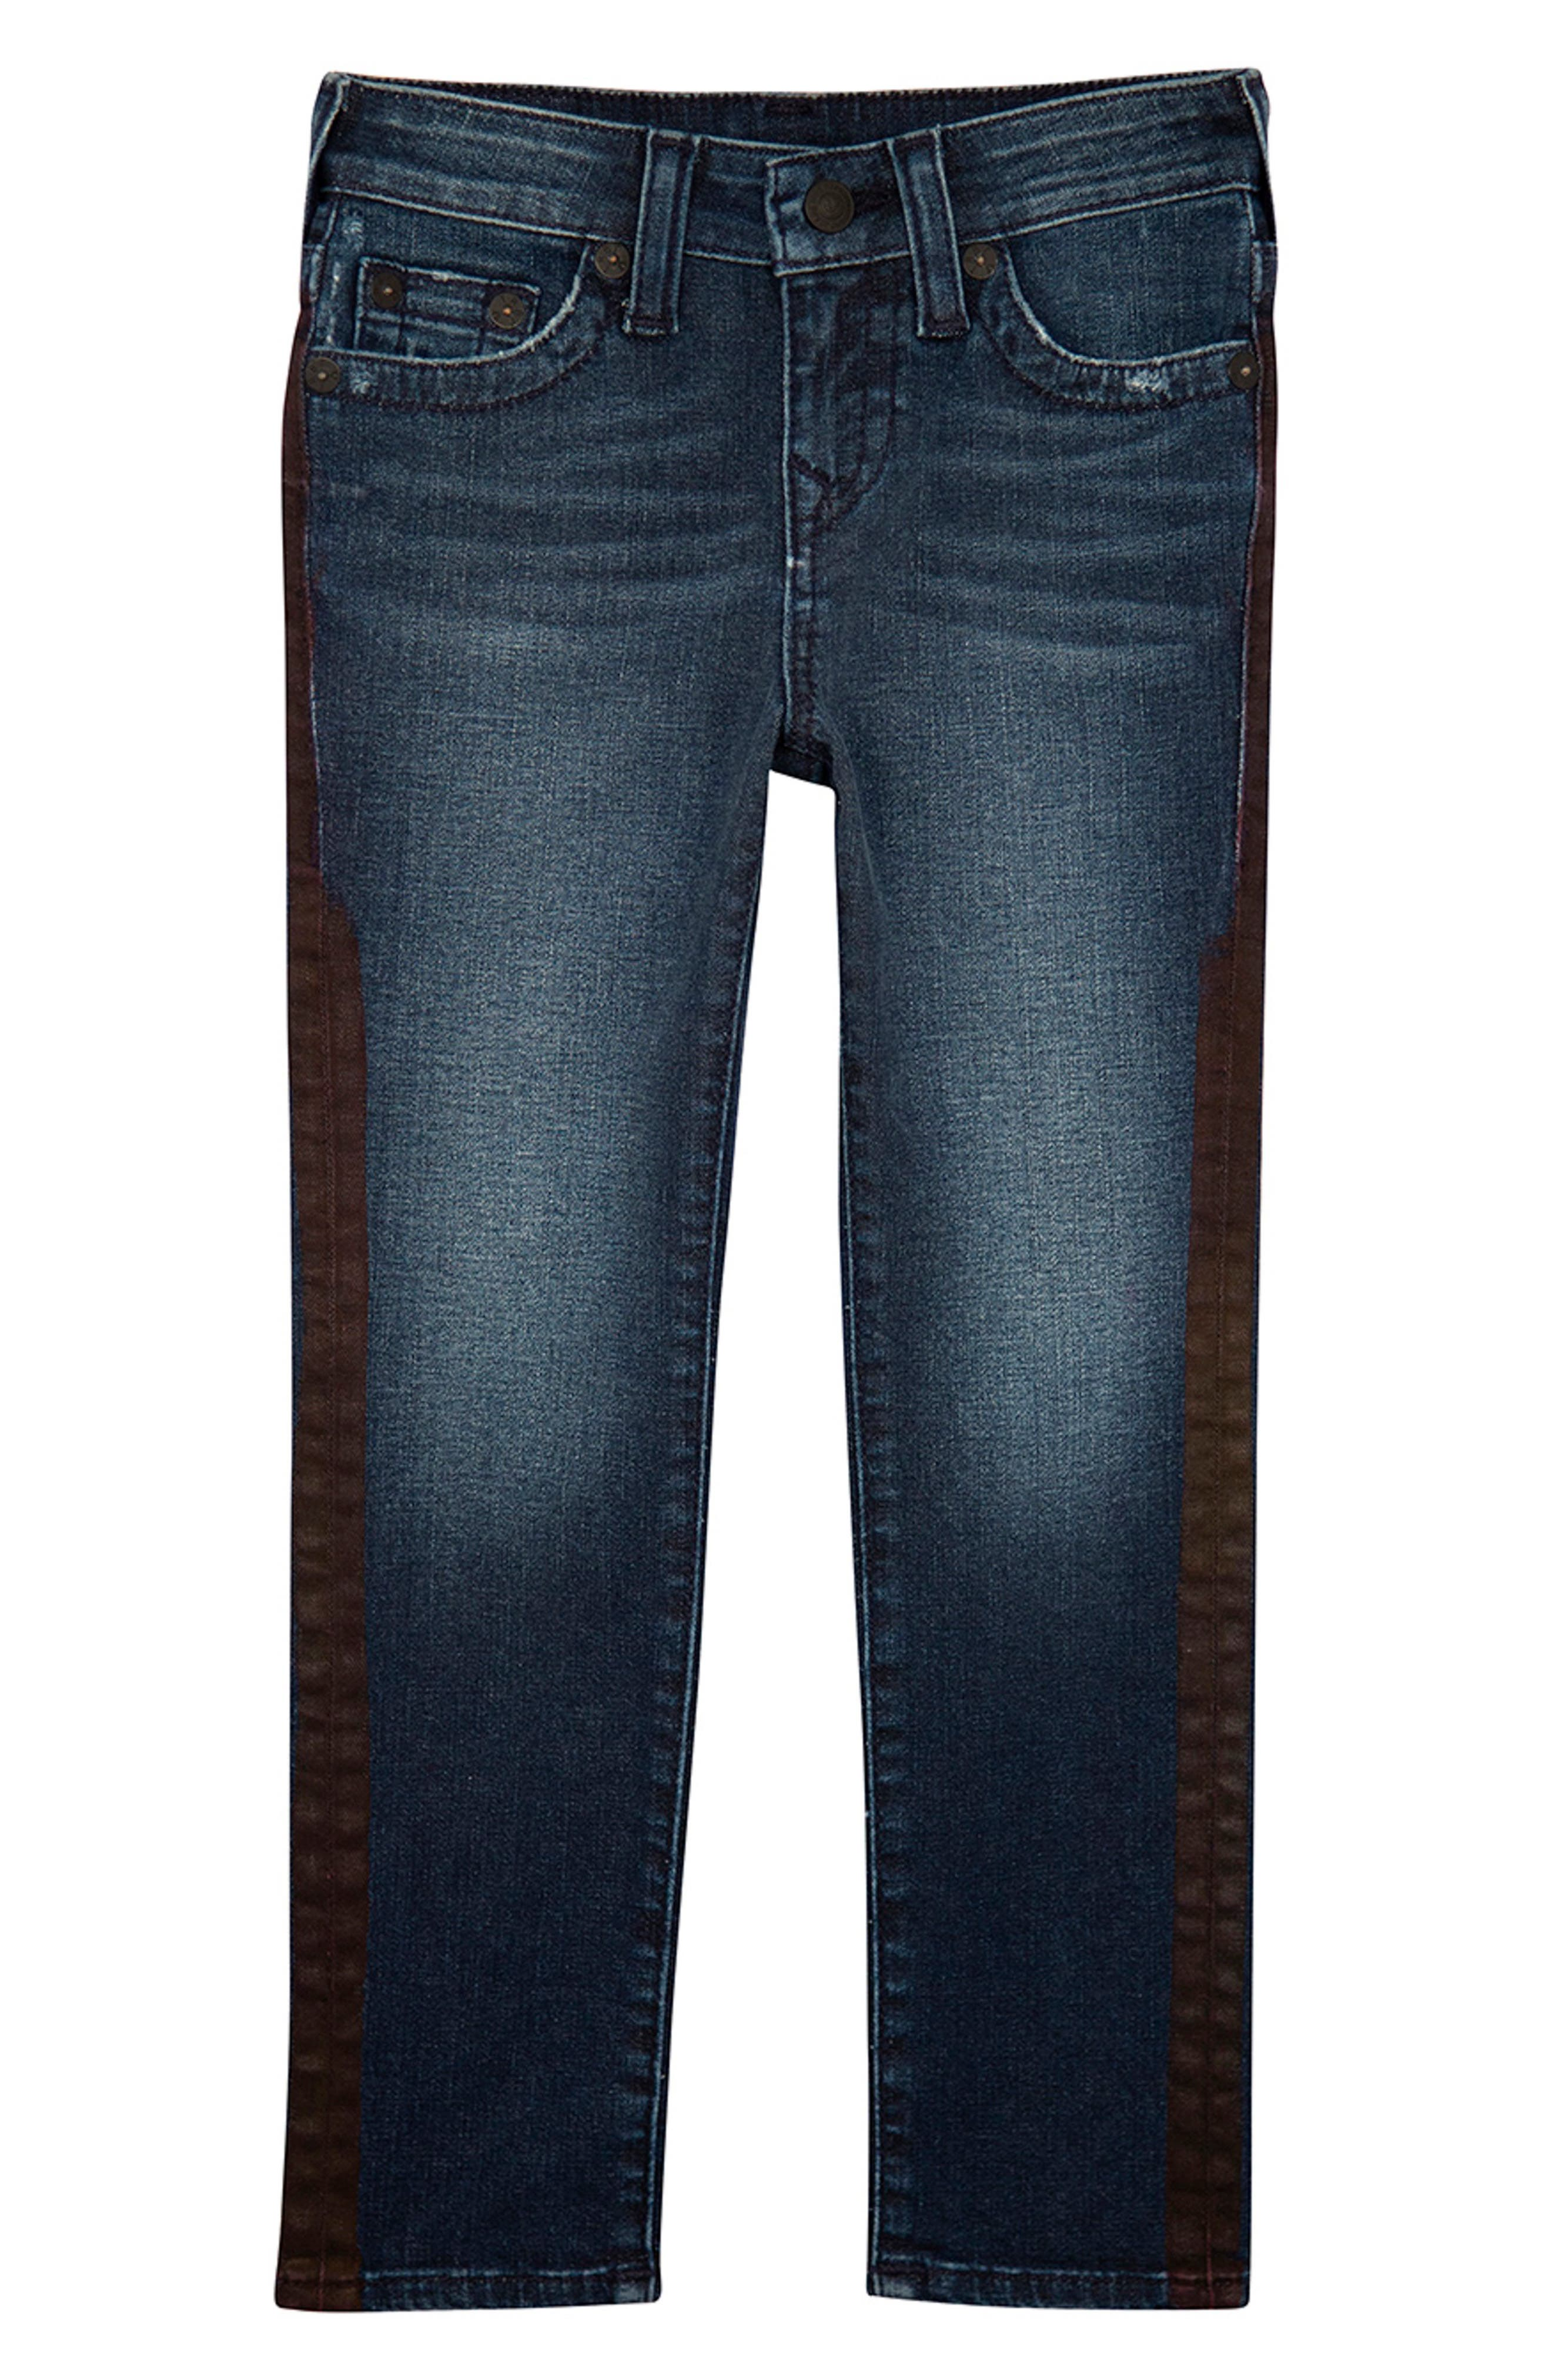 Boys True Religion Brand Jeans Rocco Skinny Fit Jeans